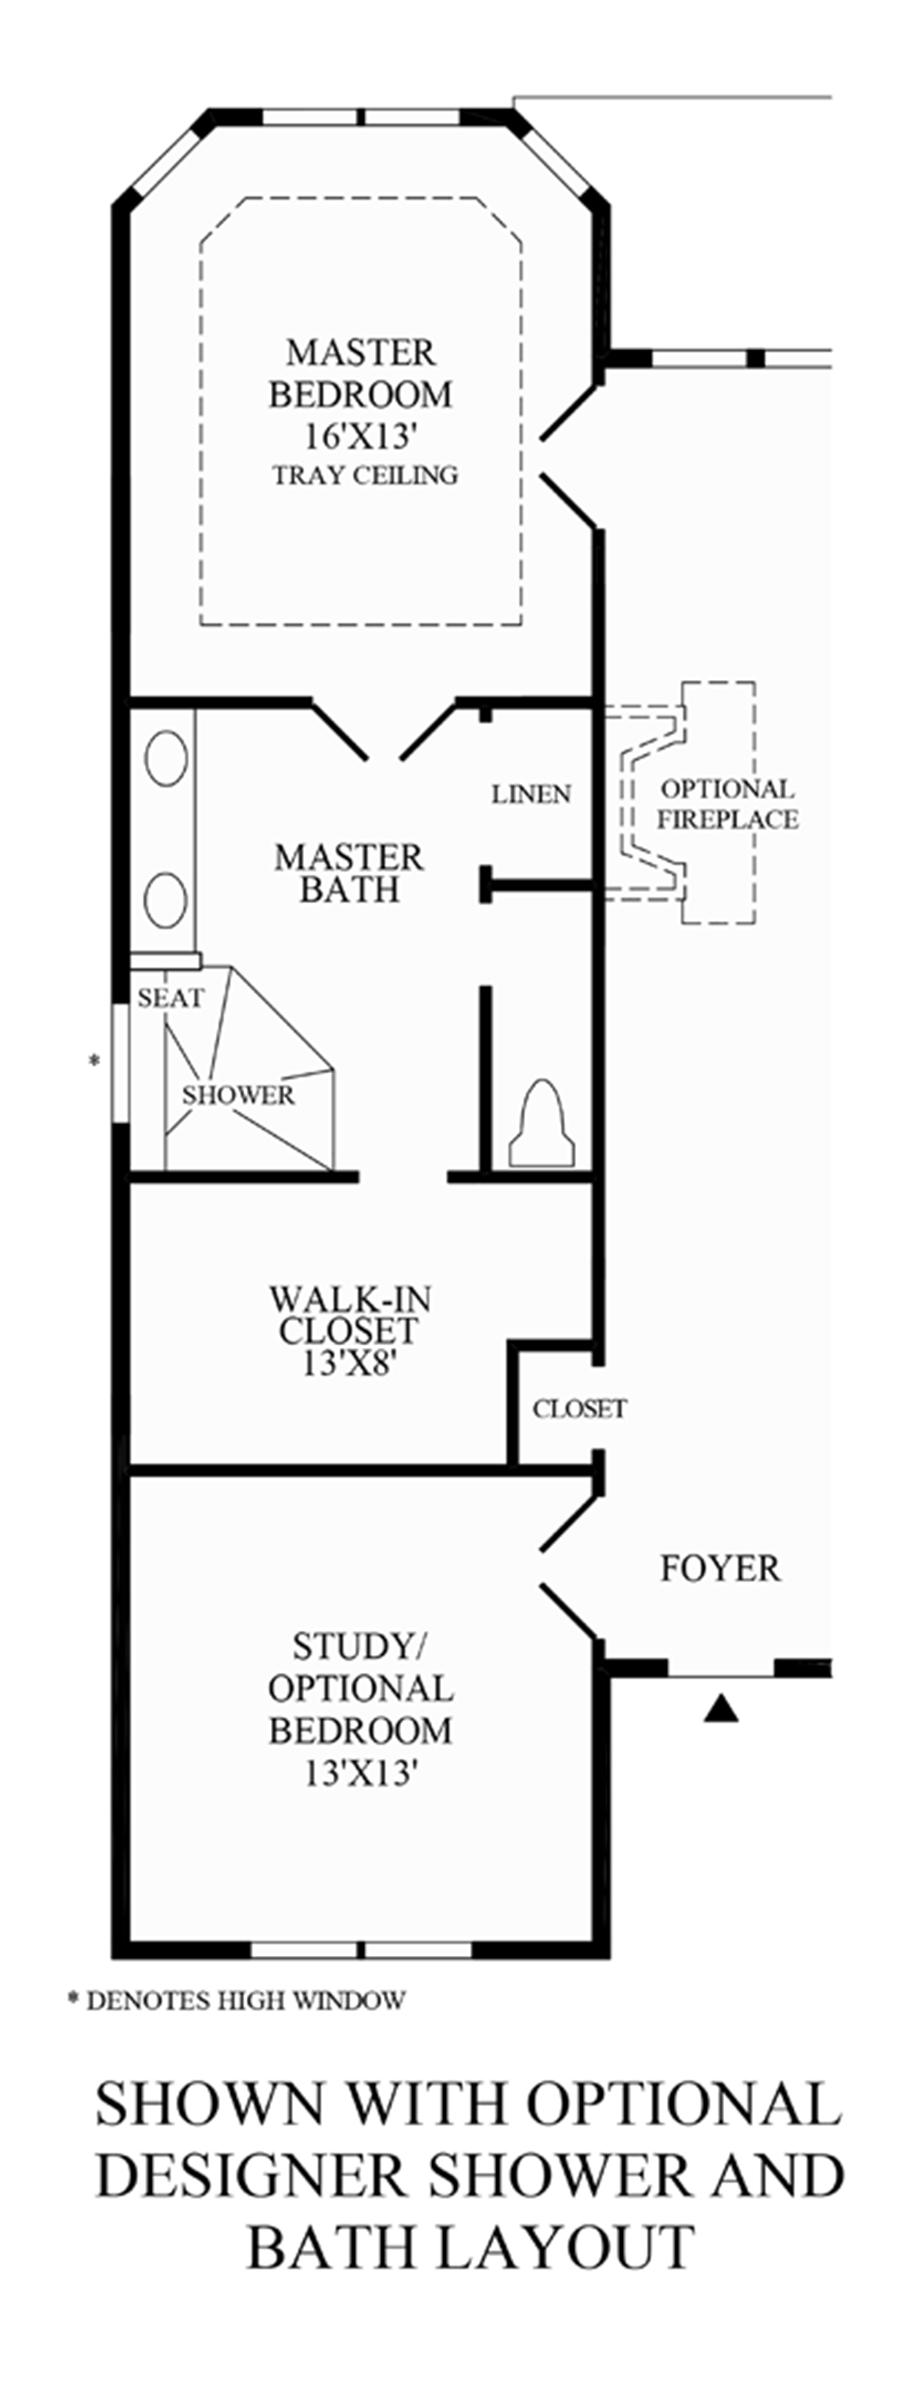 Optional Designer Shower and Bath Layout